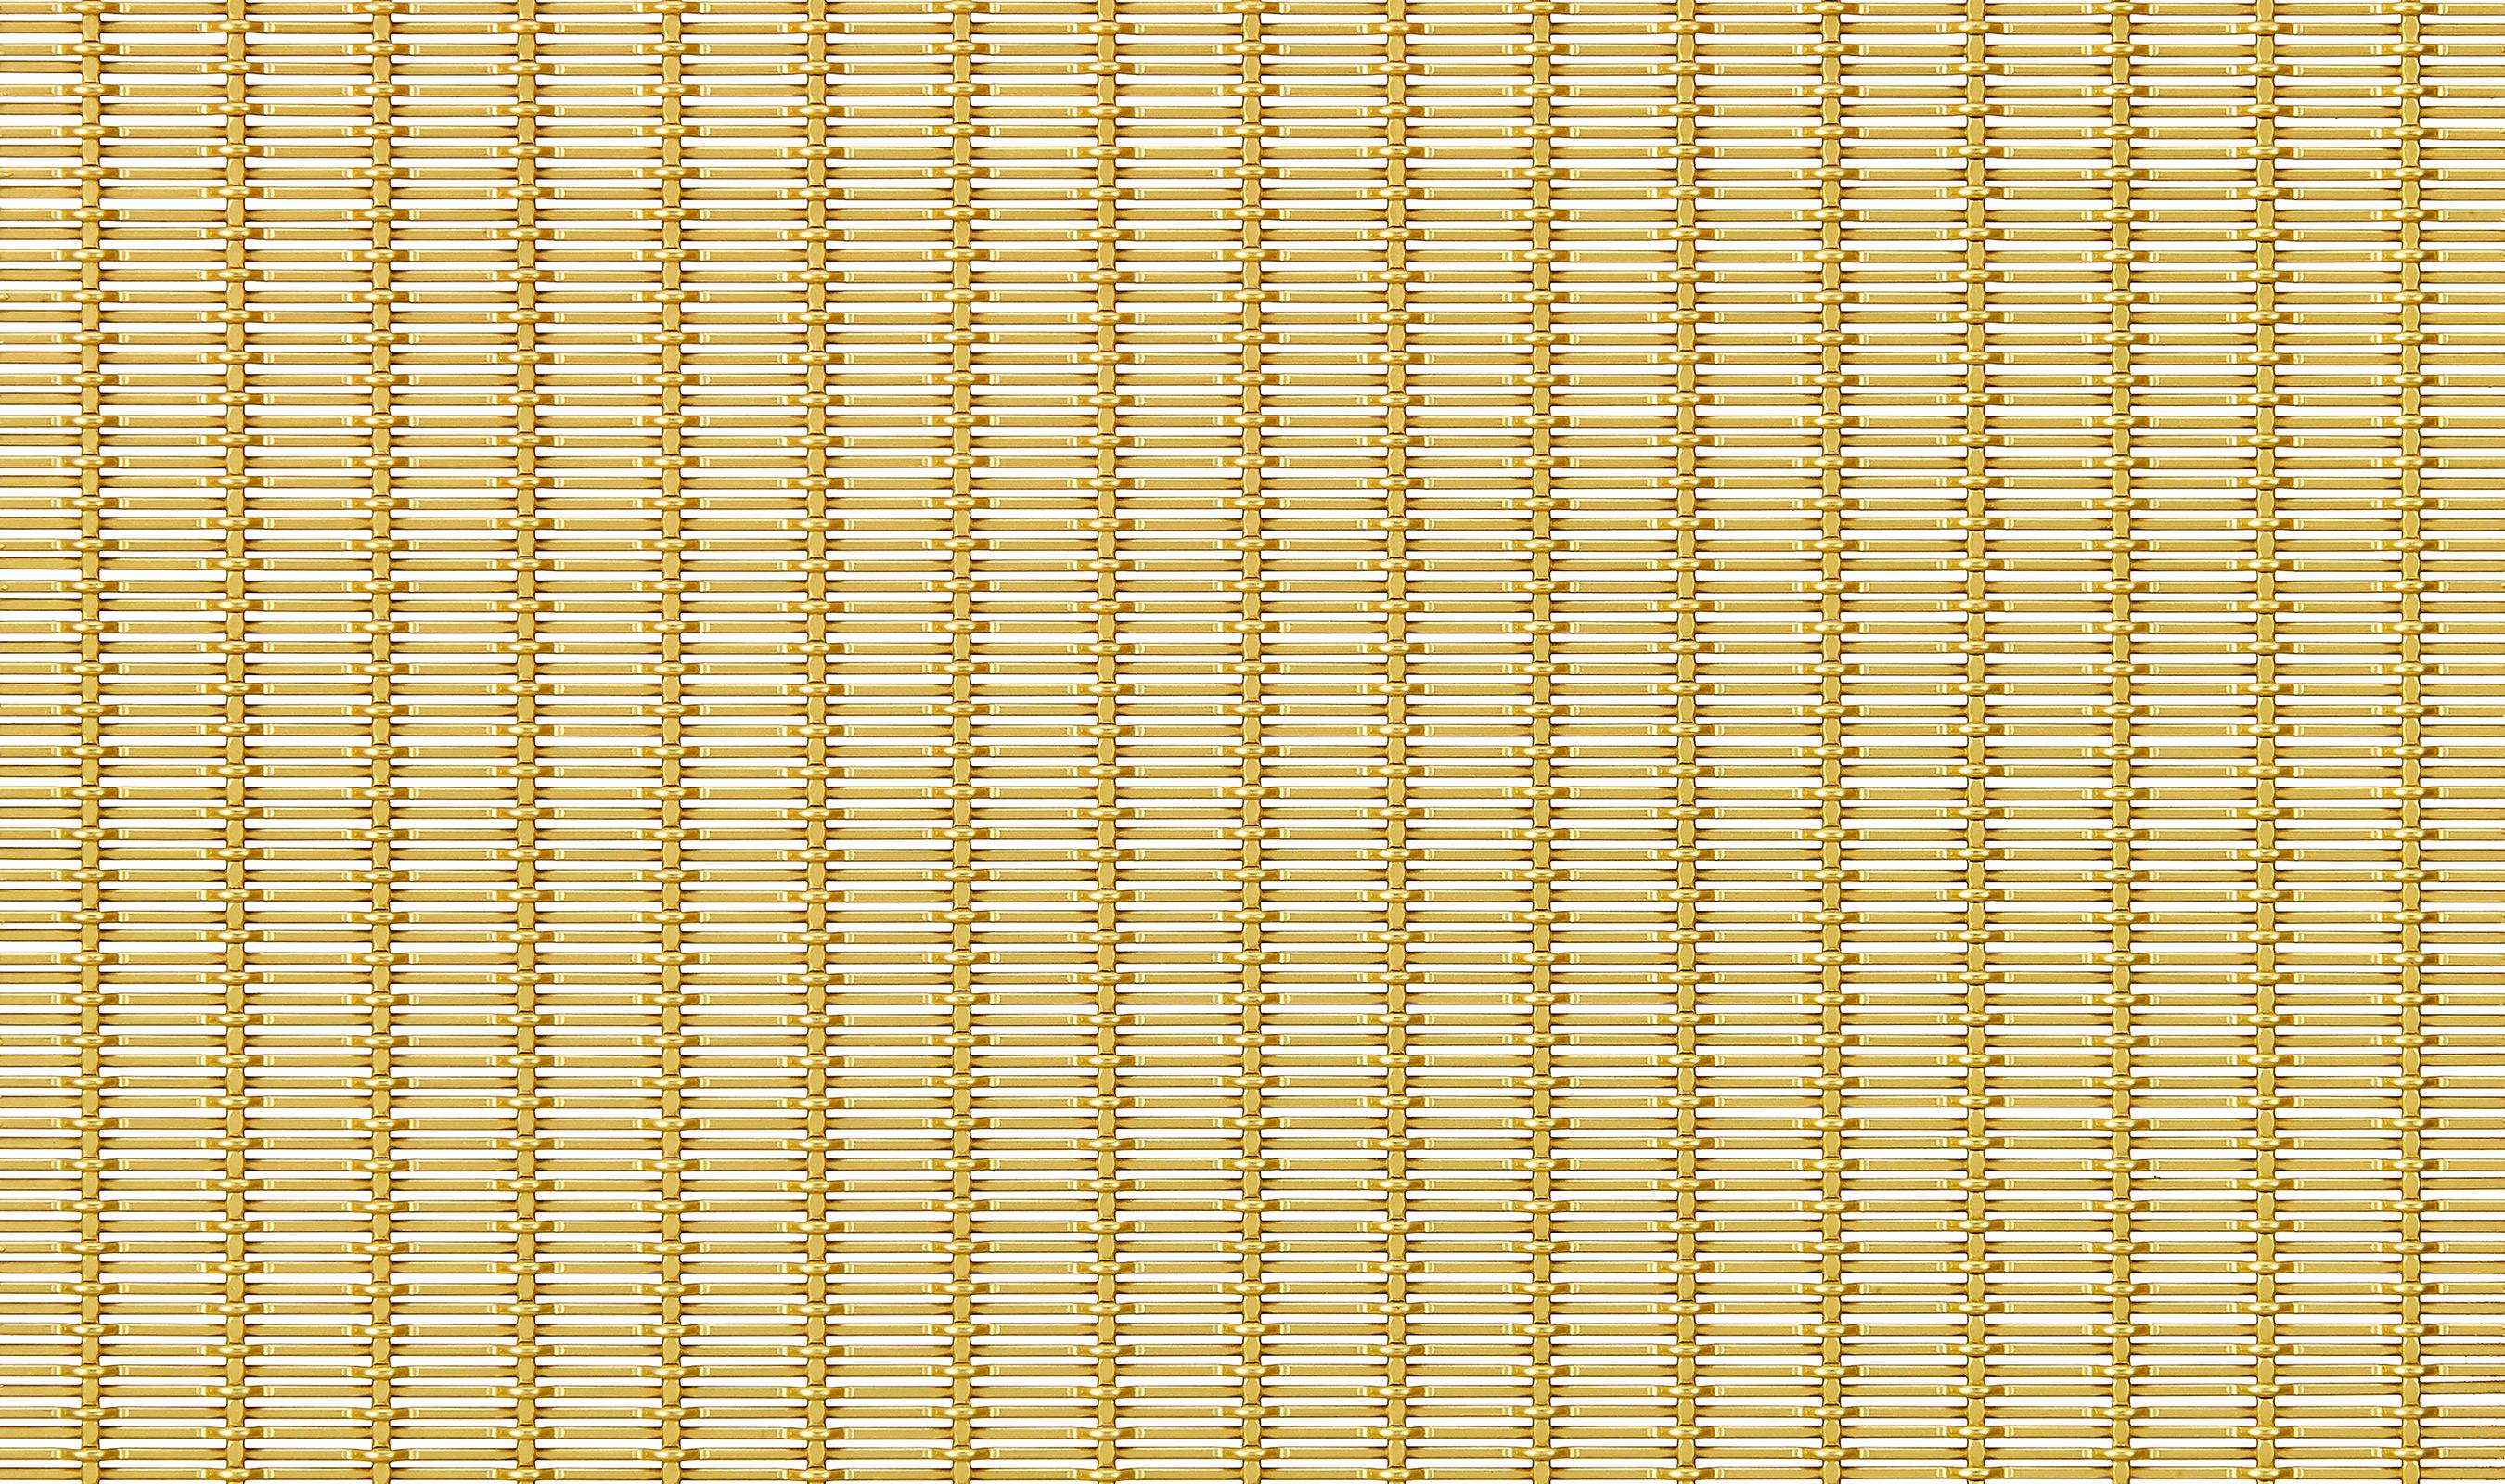 PFZ-43 Satin Brass plated woven wire mesh